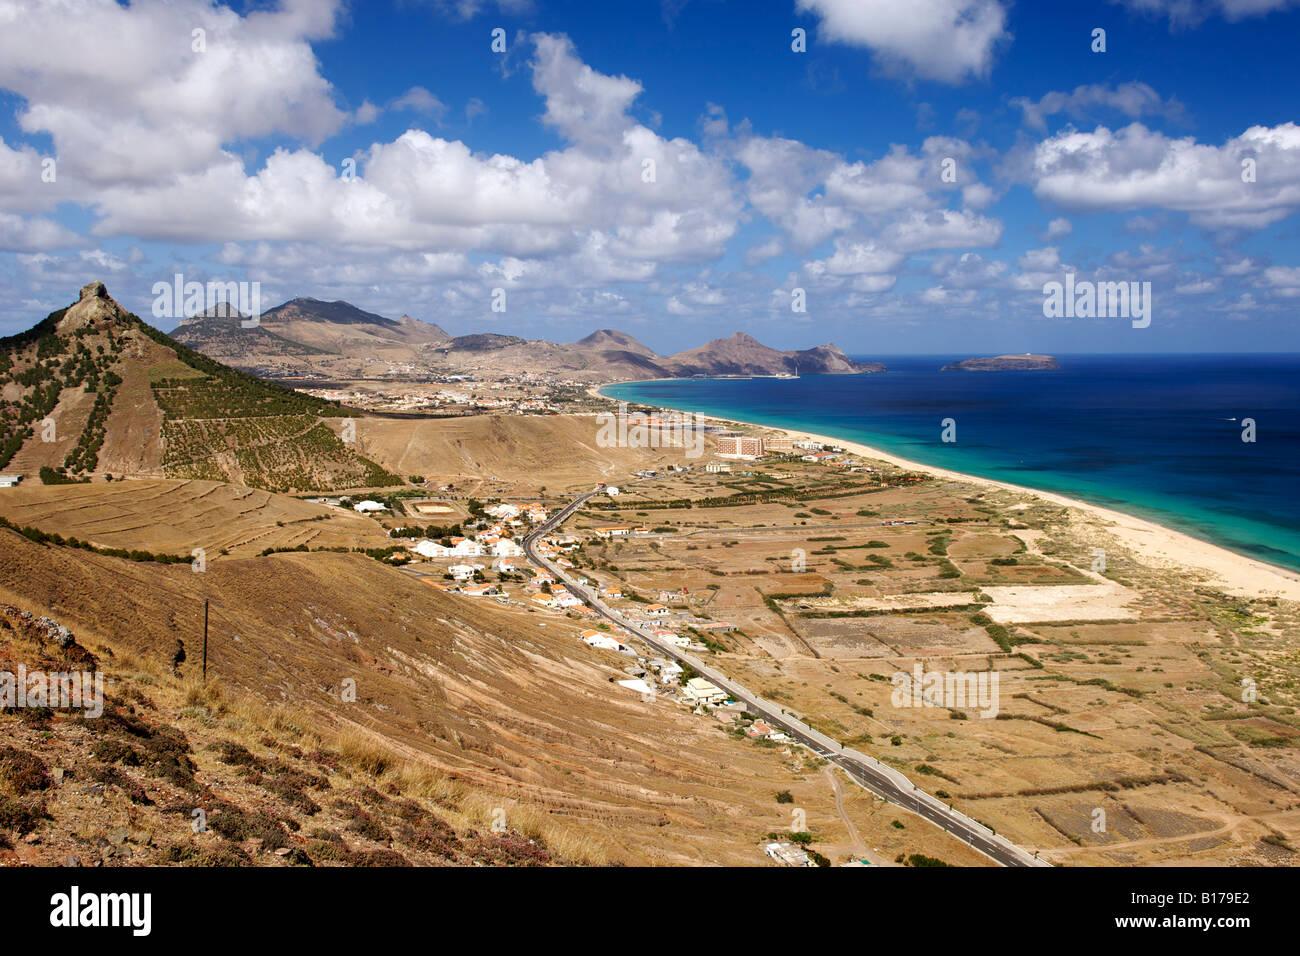 View along the beach of the Portuguese Atlantic island of Porto Santo from Miradouro das Flores. - Stock Image